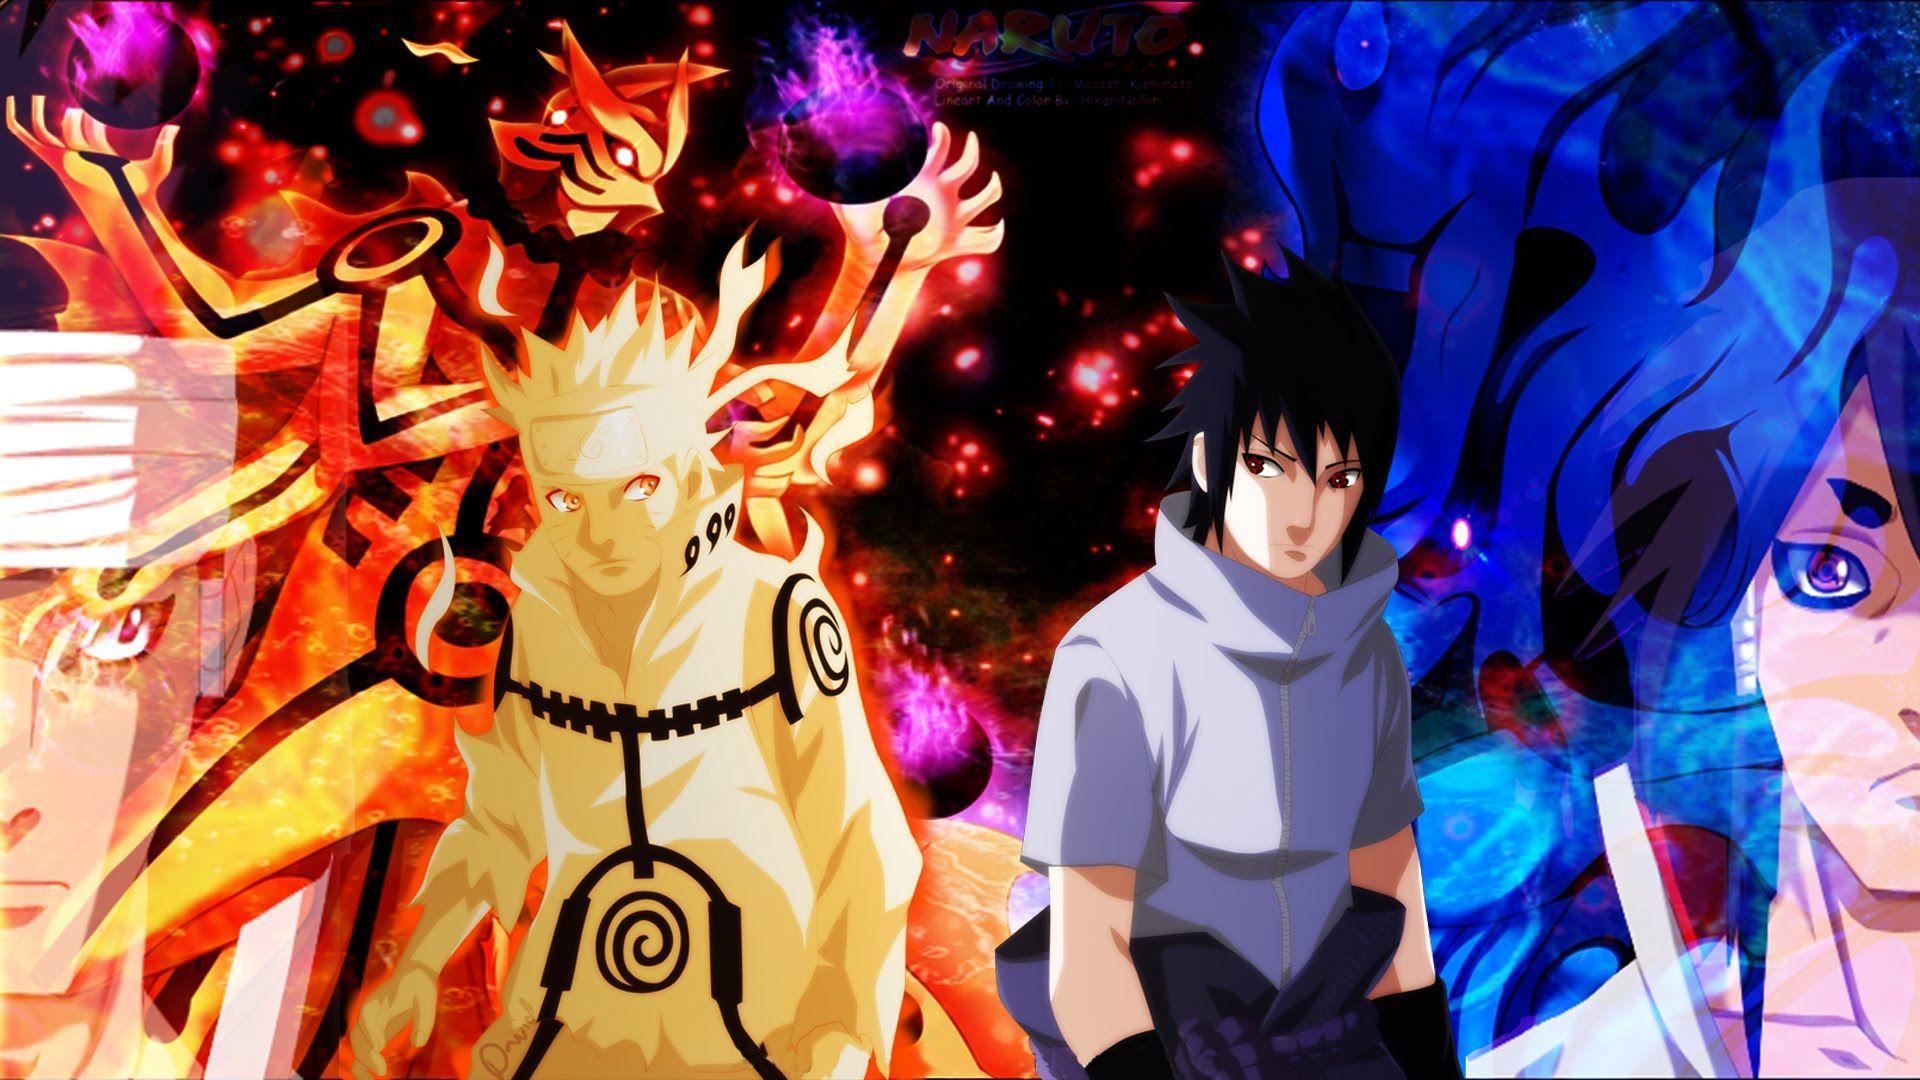 Will Sasuke Die In Naruto? Did Sasuke Saves Naruto? Everything About Naruto